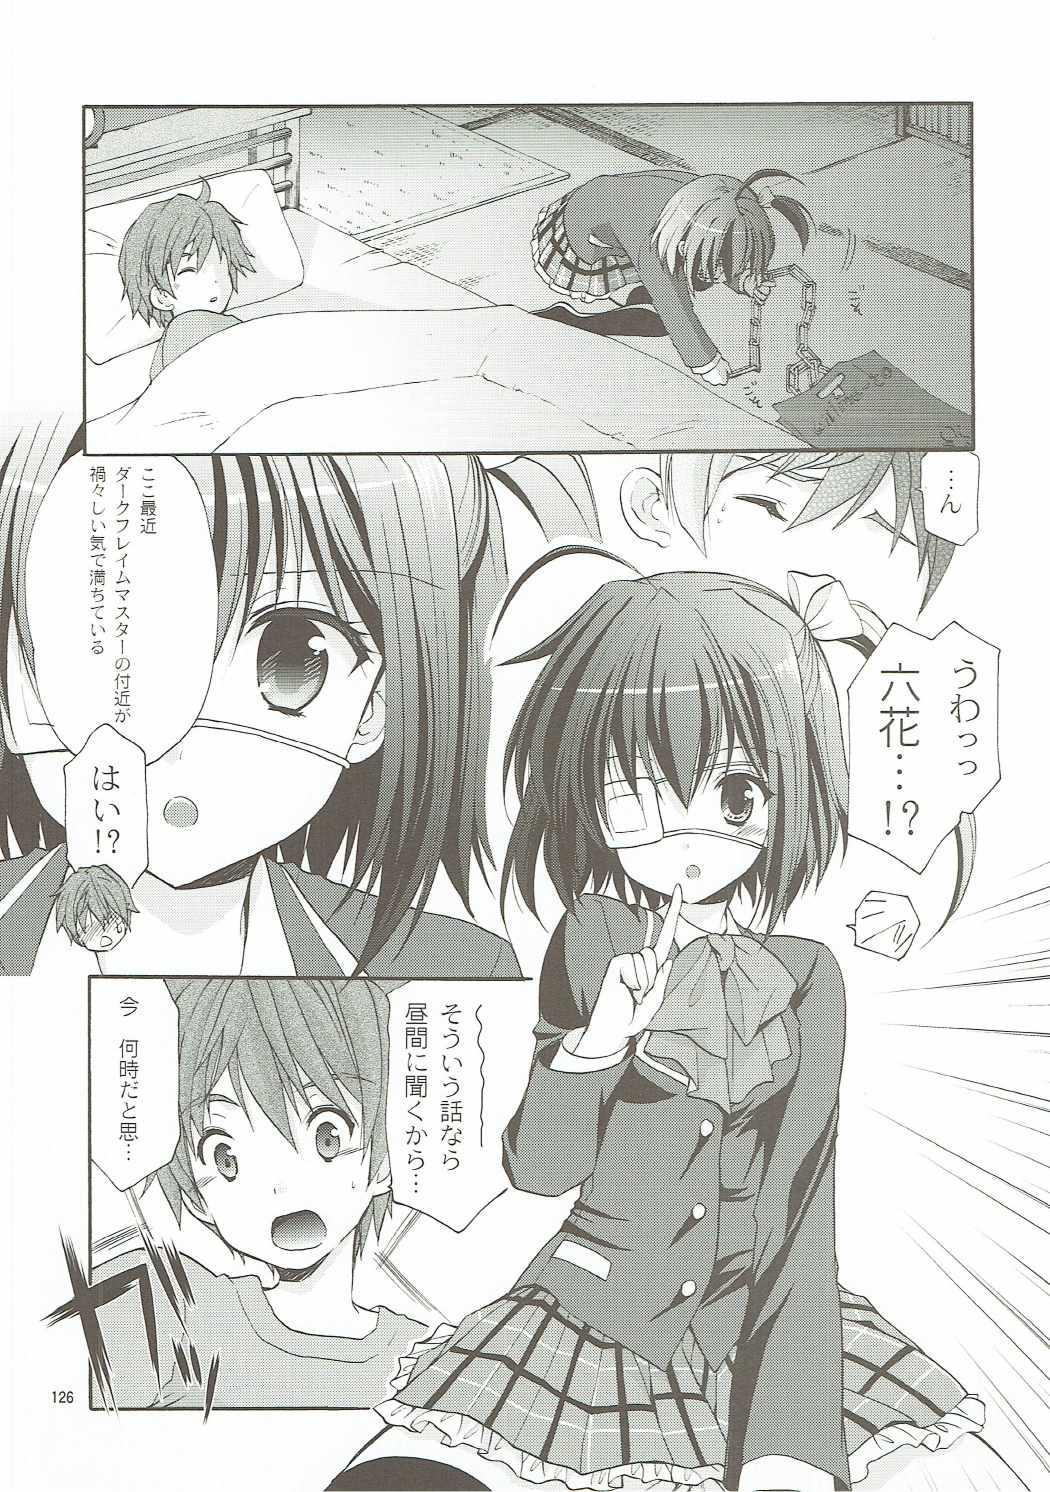 ANIME COLLECTION Imomuya Honpo - Singleton Anime Soushuuhen 124